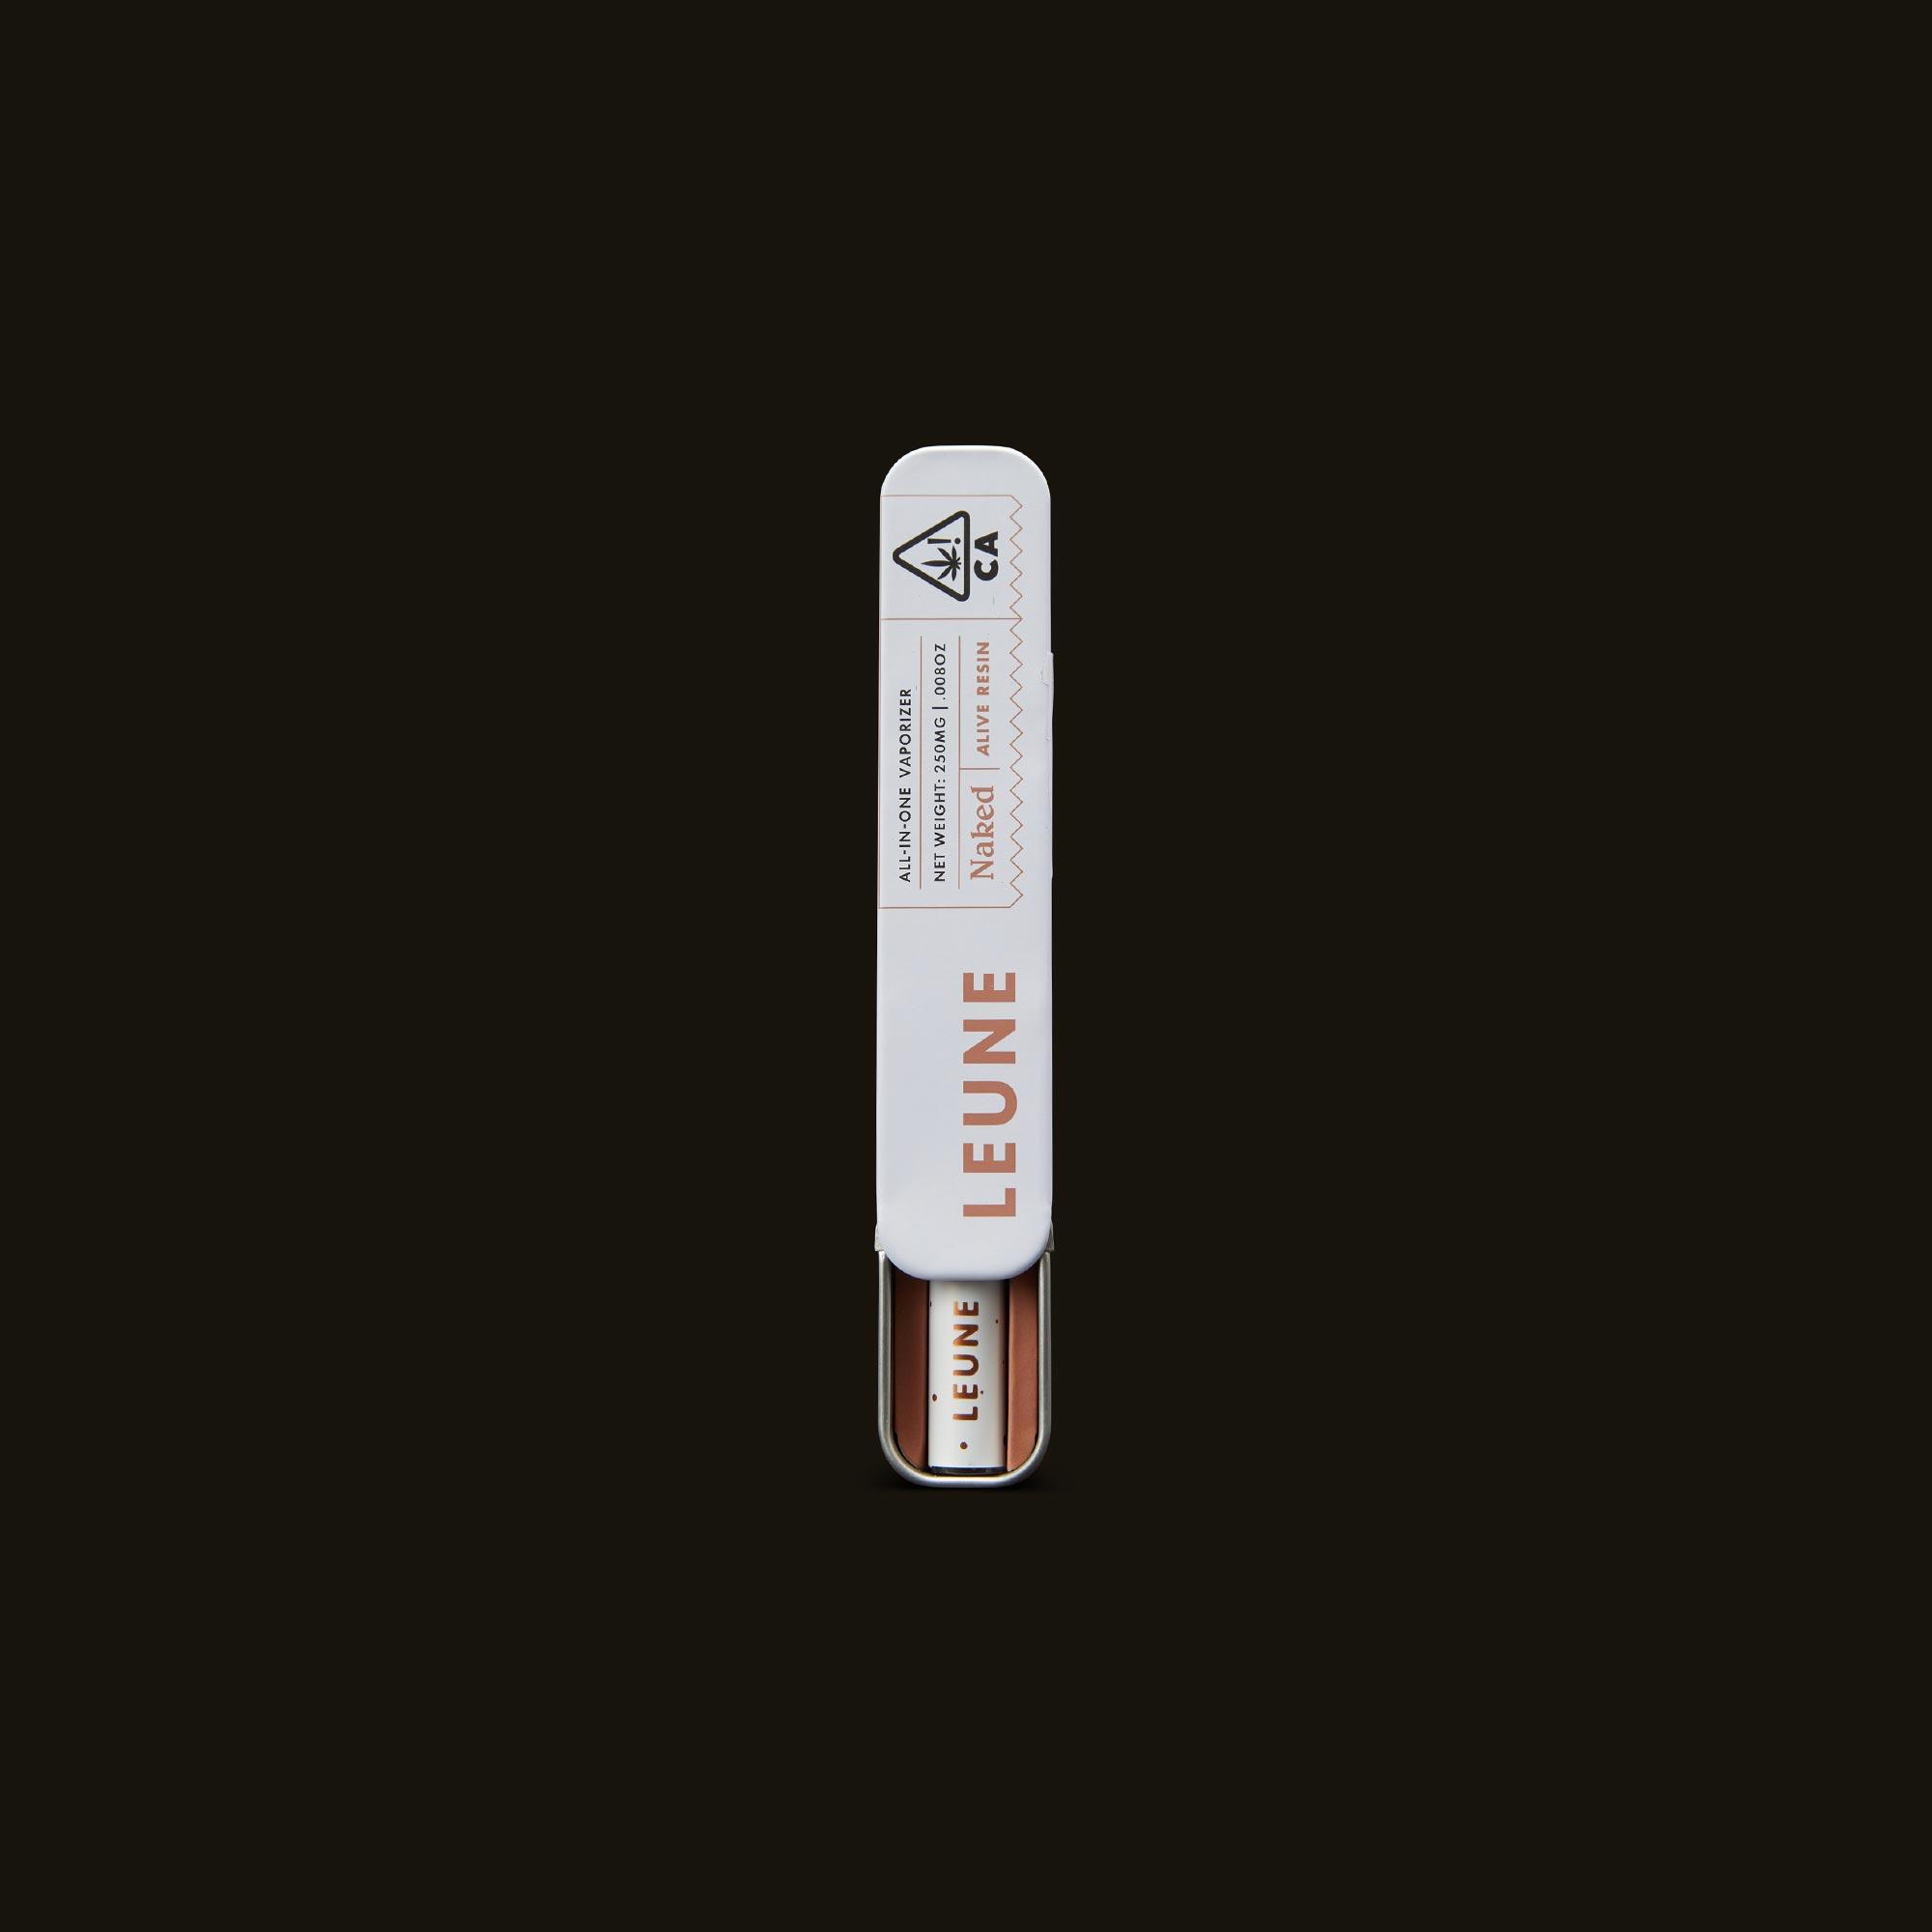 LEUNE Naked Tangie Live Resin Open Packaging